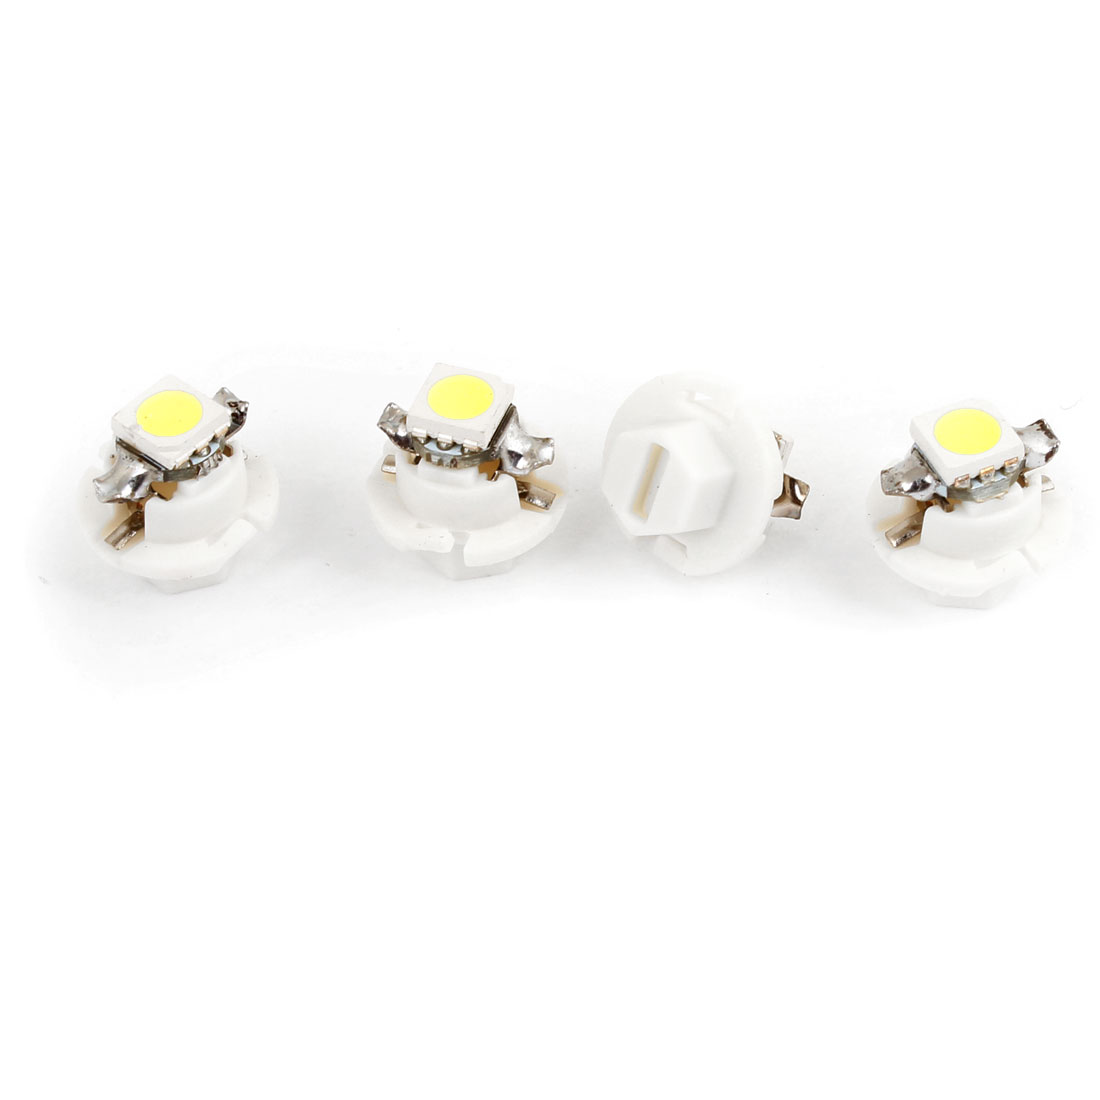 4 Pcs White B8.4 5050 SMD 1 LED Dash Board Gauge Light Bulb for Car